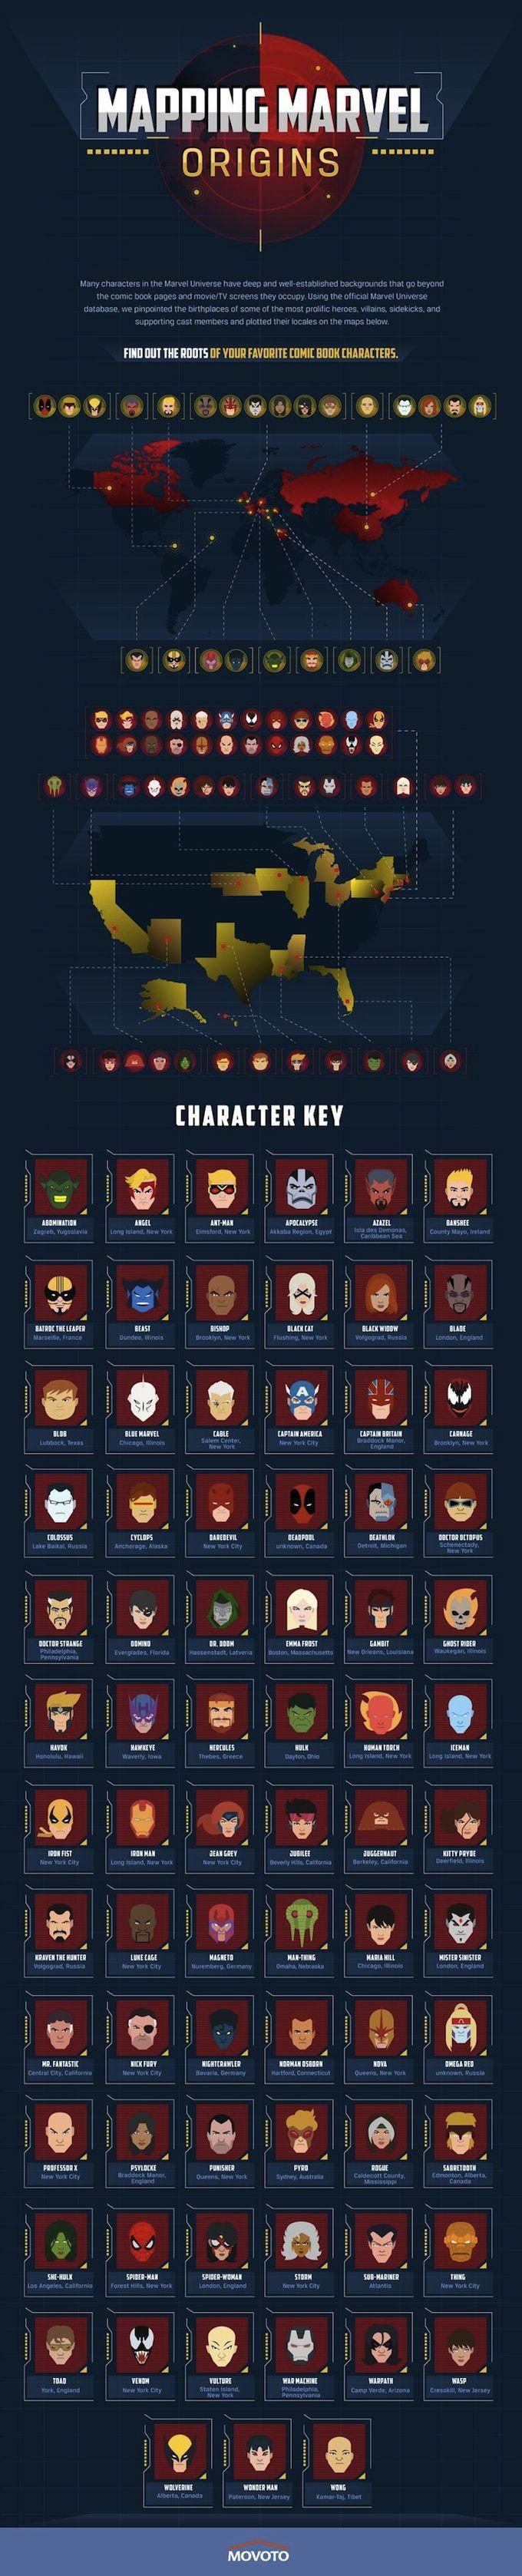 Complete List of Marvel Character Origins